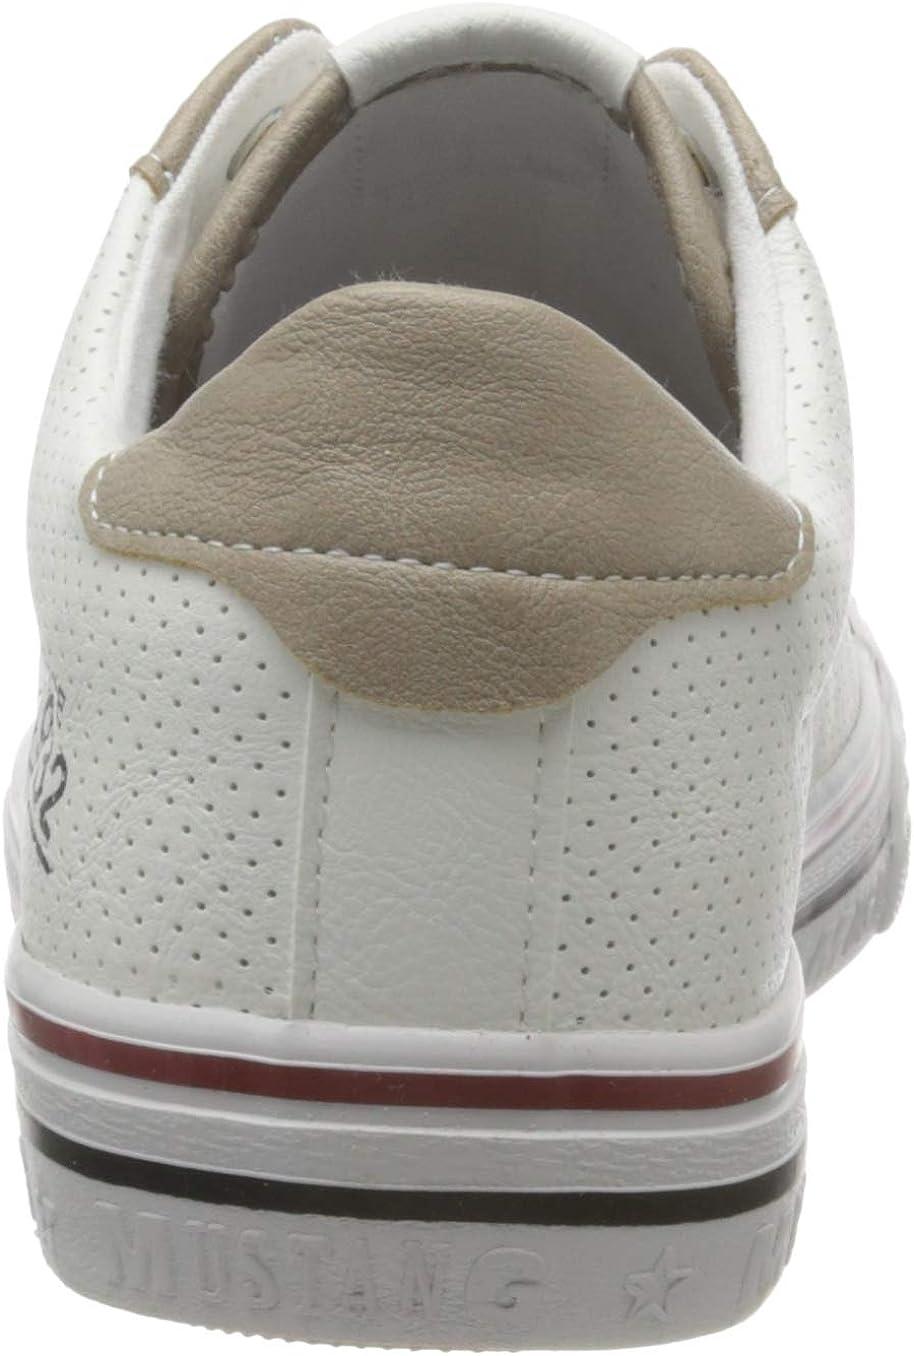 Sneakers Basses Fille Mustang 5056-305-14